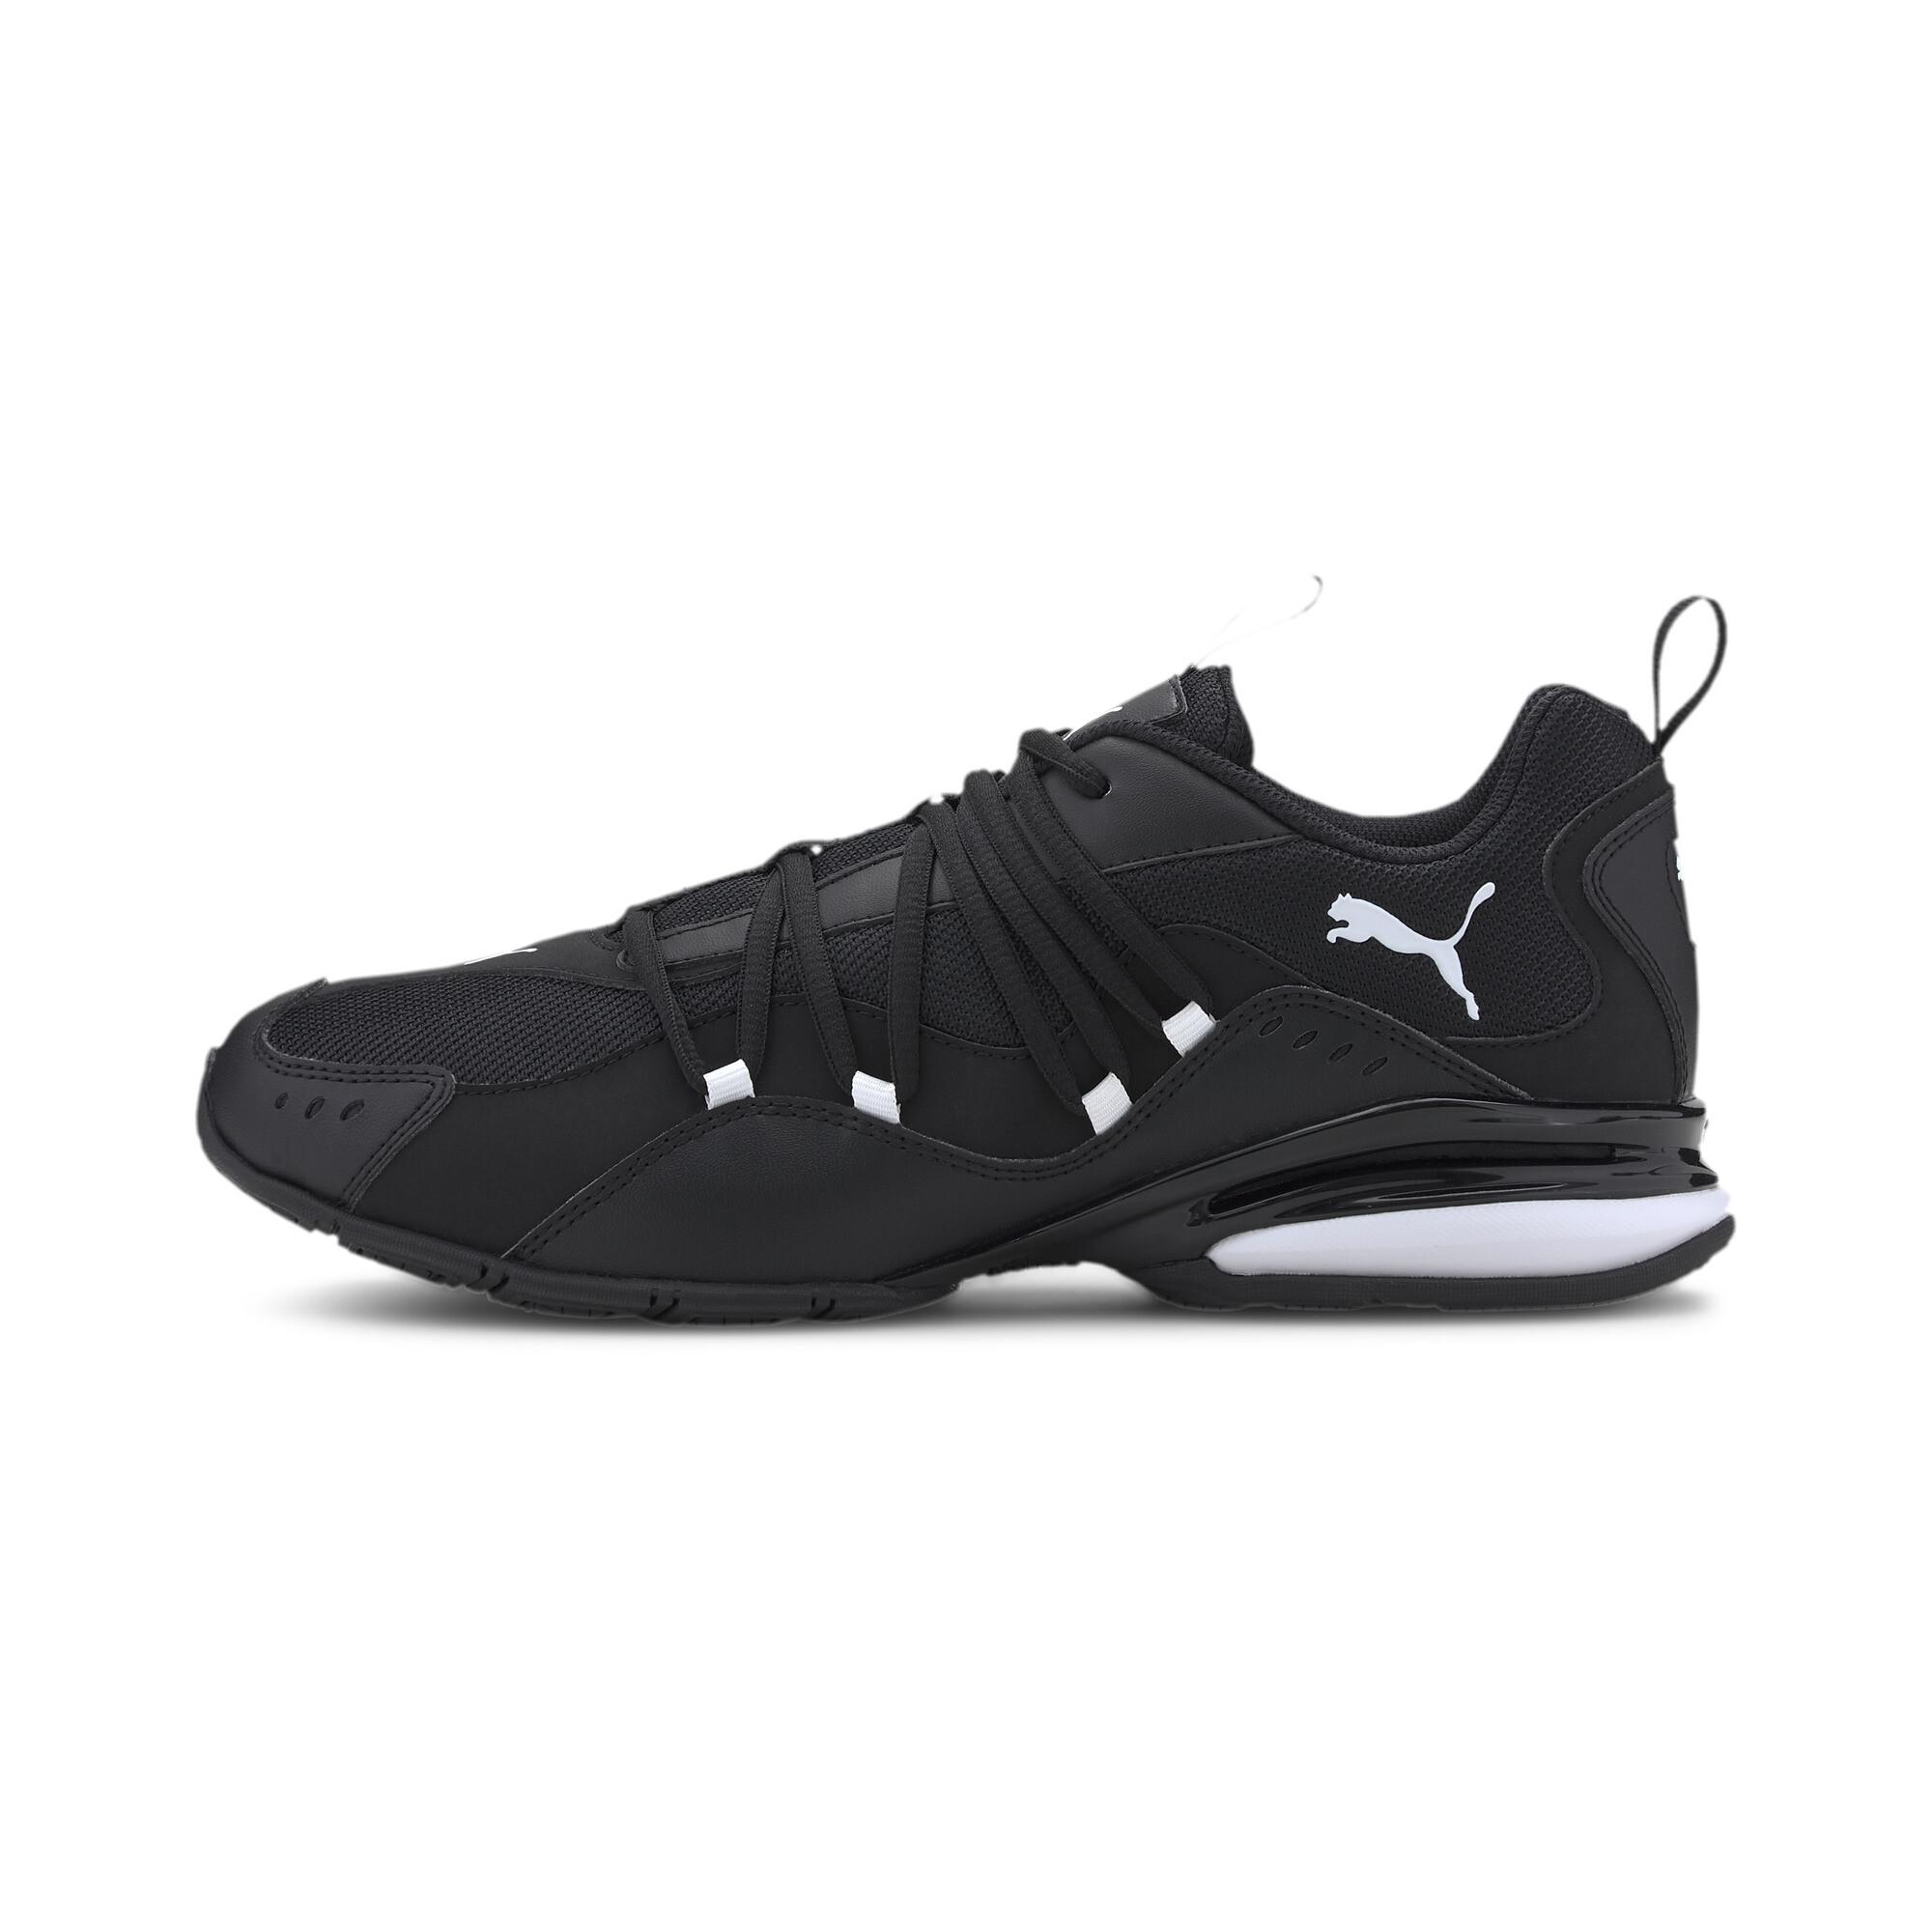 PUMA-Silverion-Men-s-Running-Shoes-Men-Shoe-Running thumbnail 9